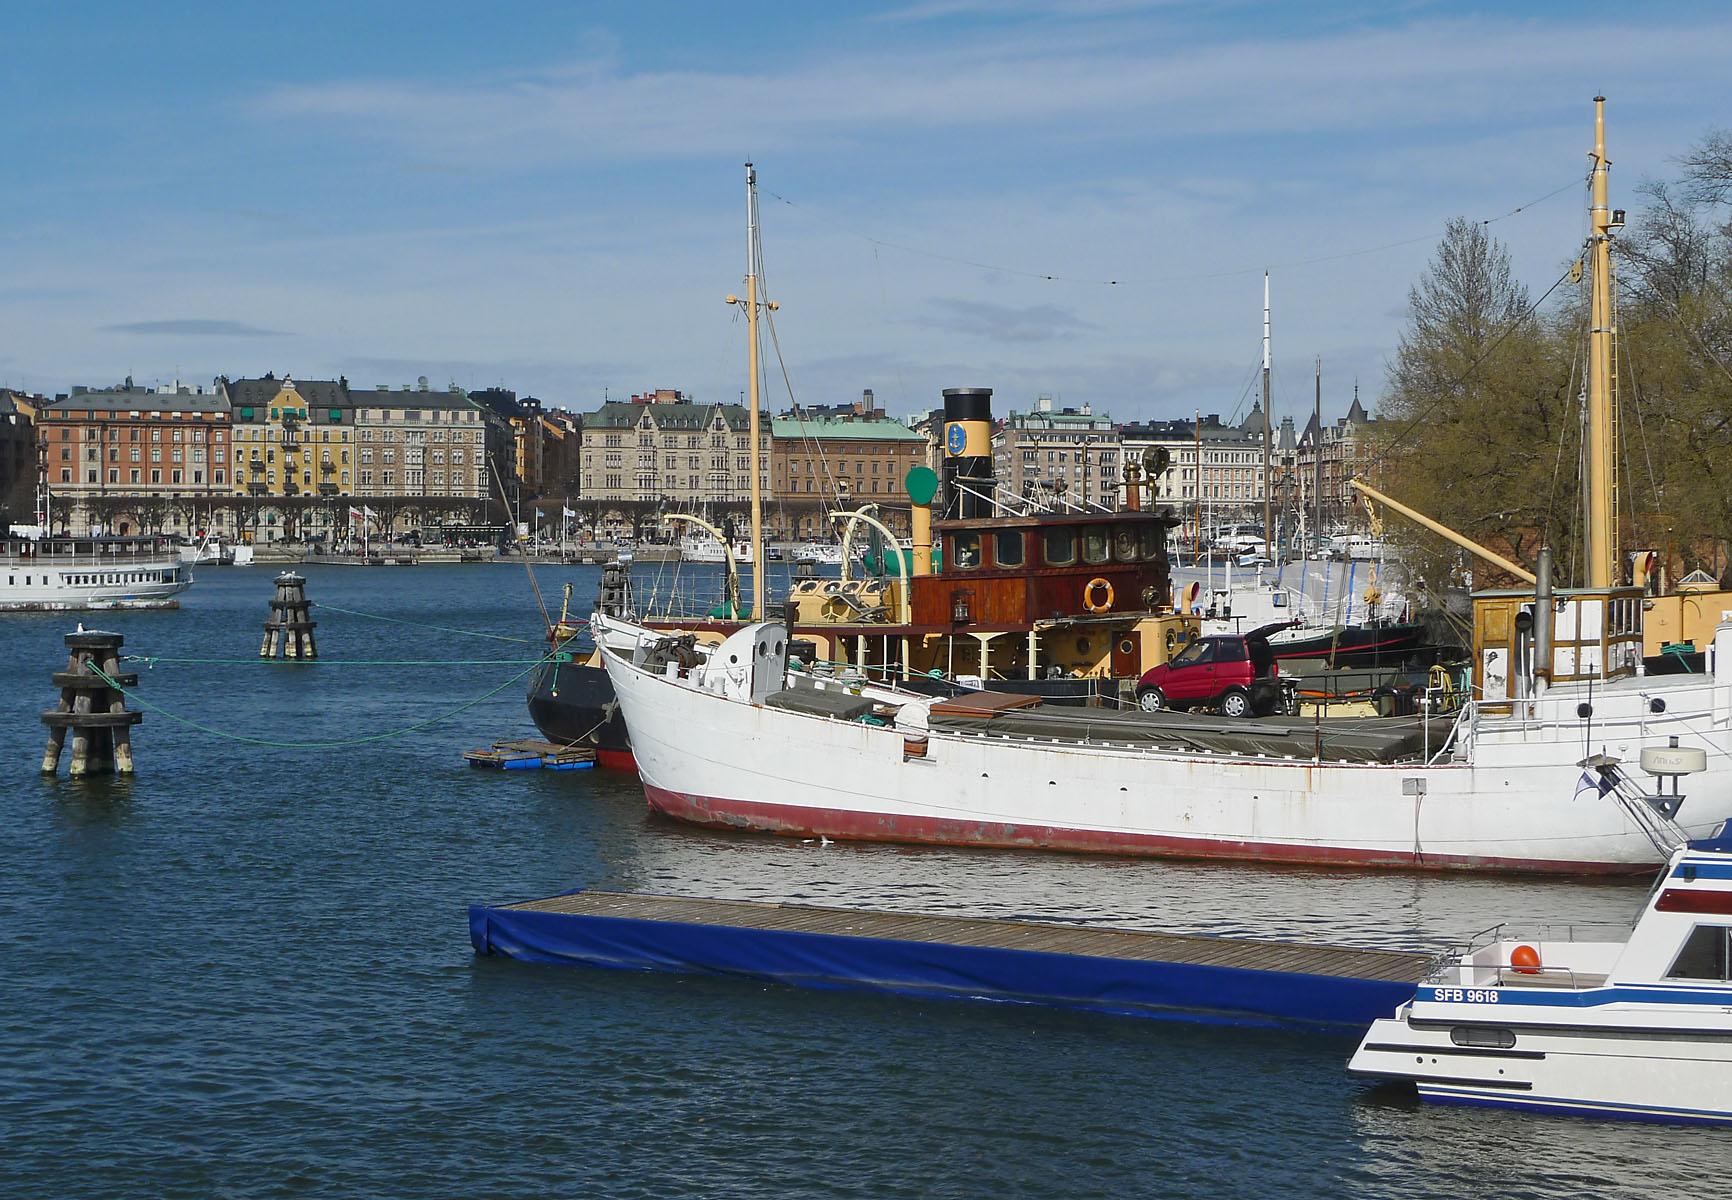 StockholmBoats